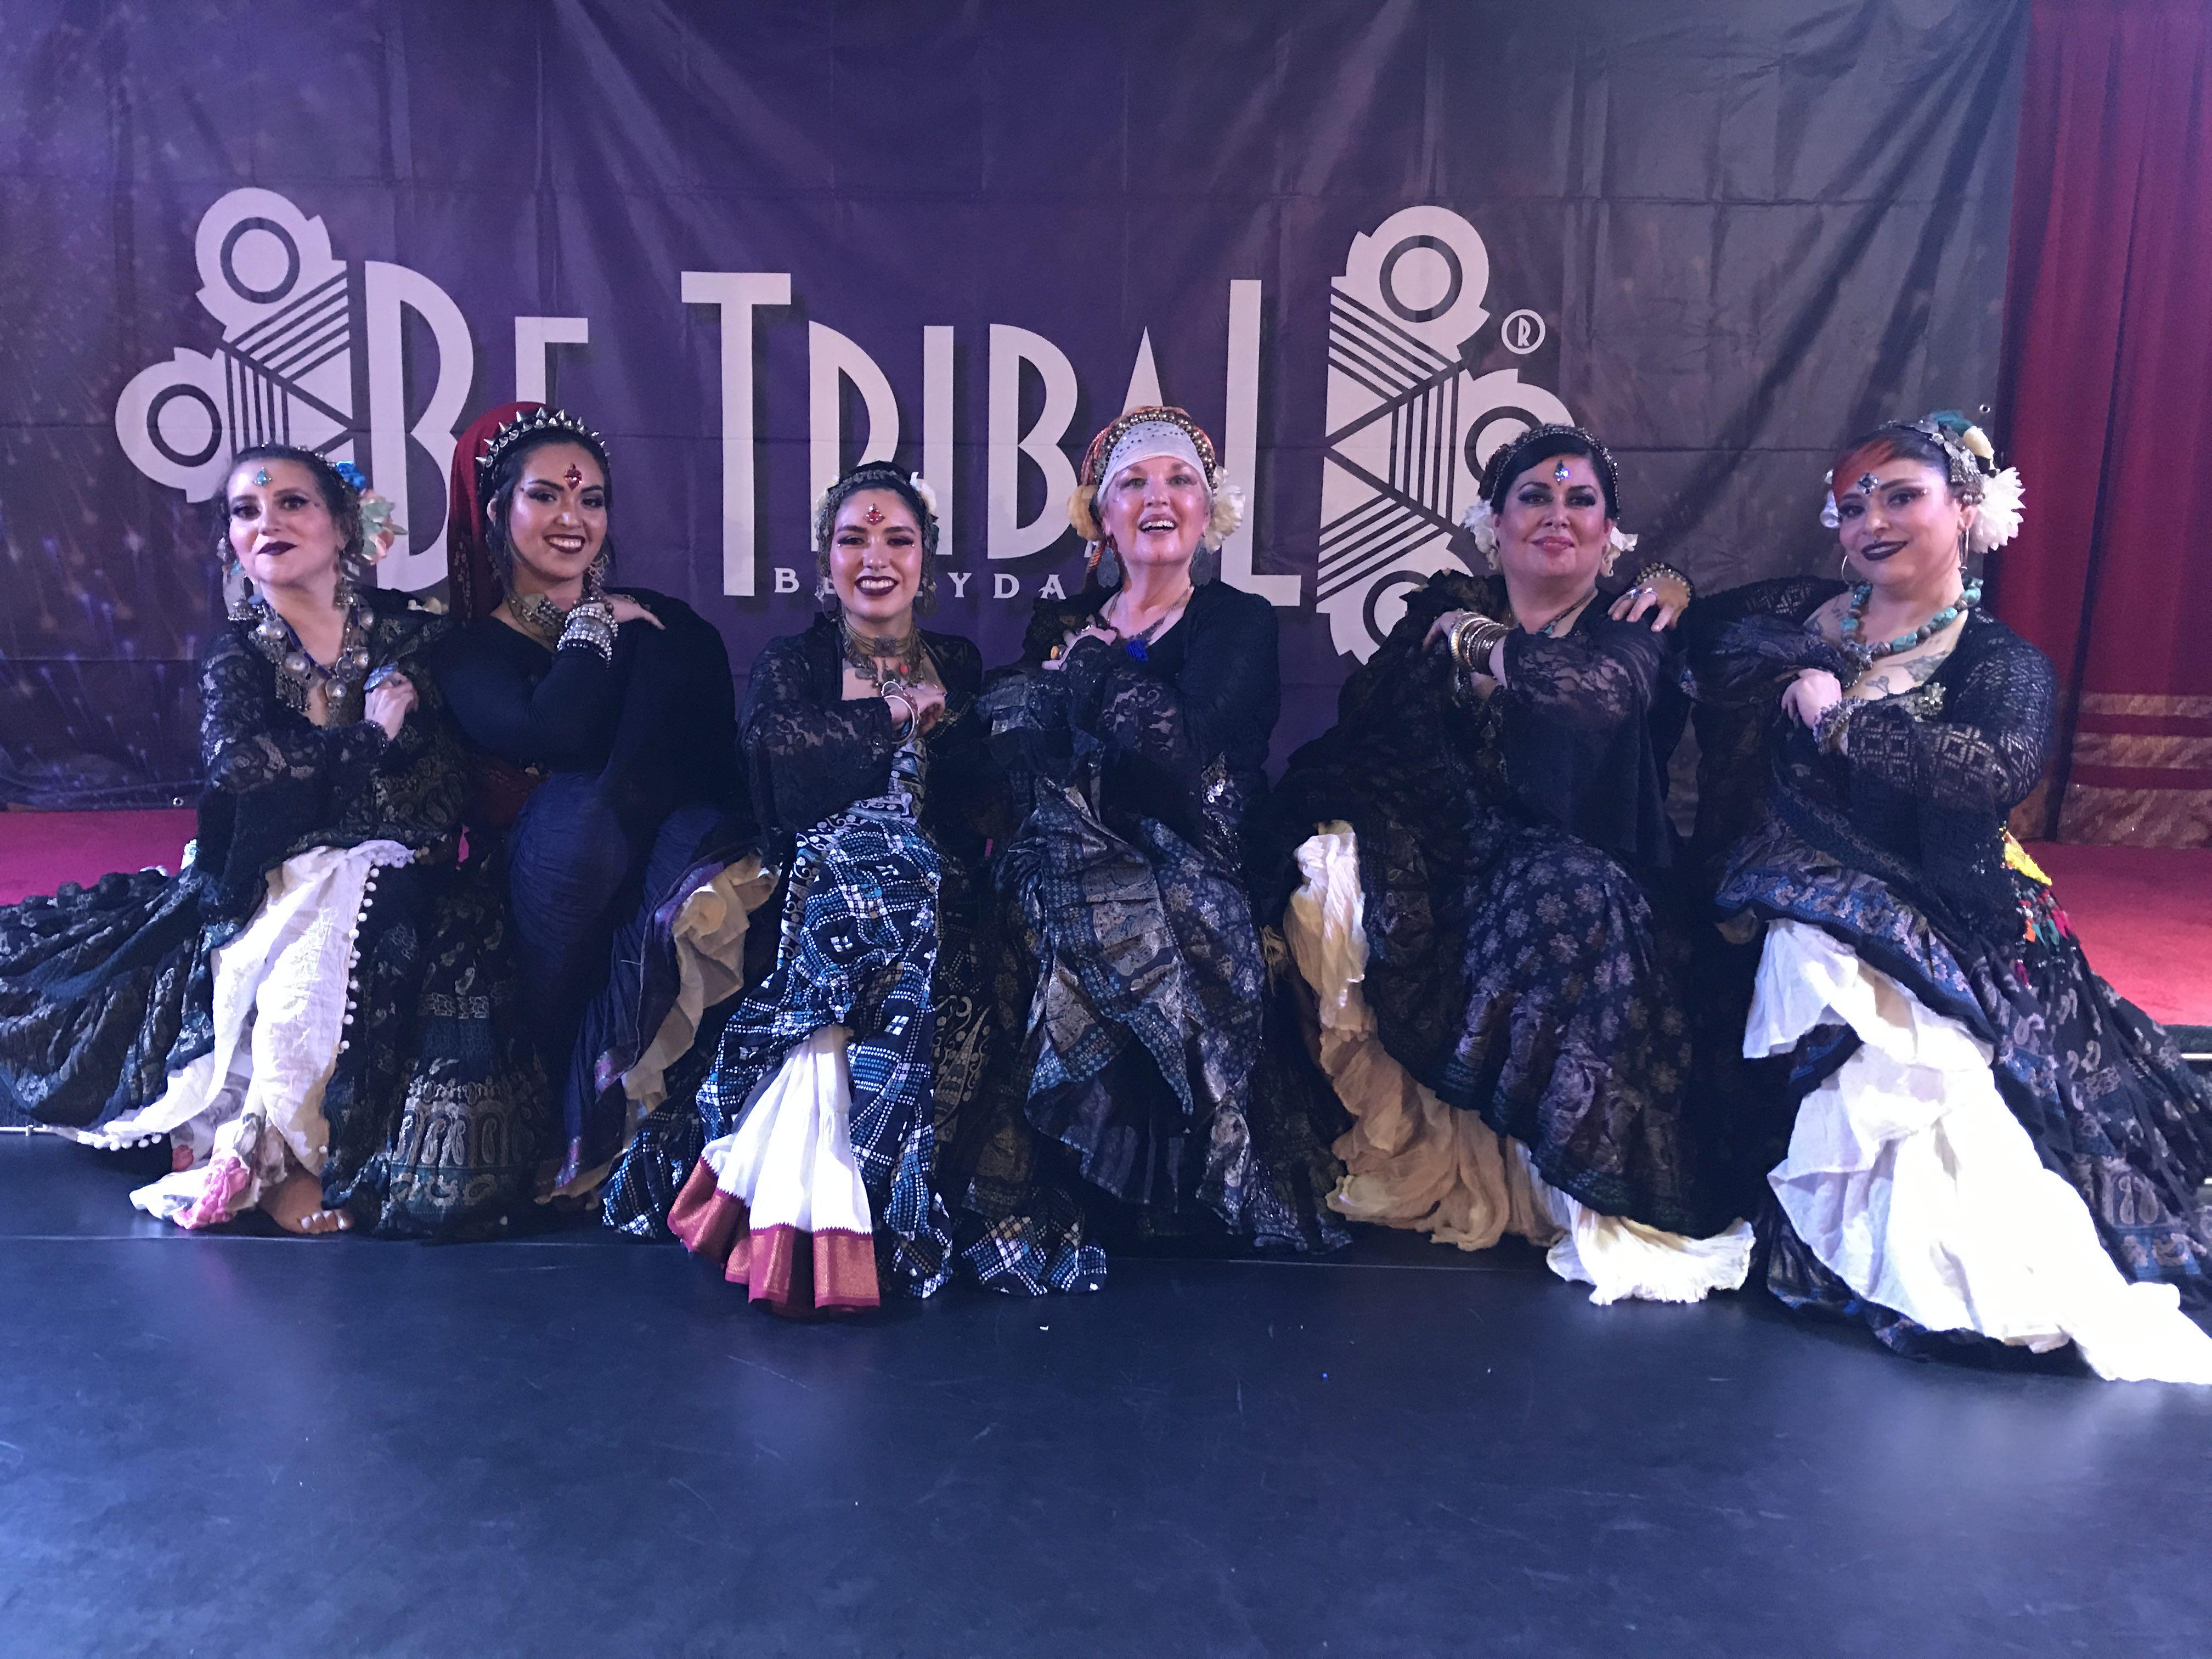 Be Tribal Bellydance 2019 23